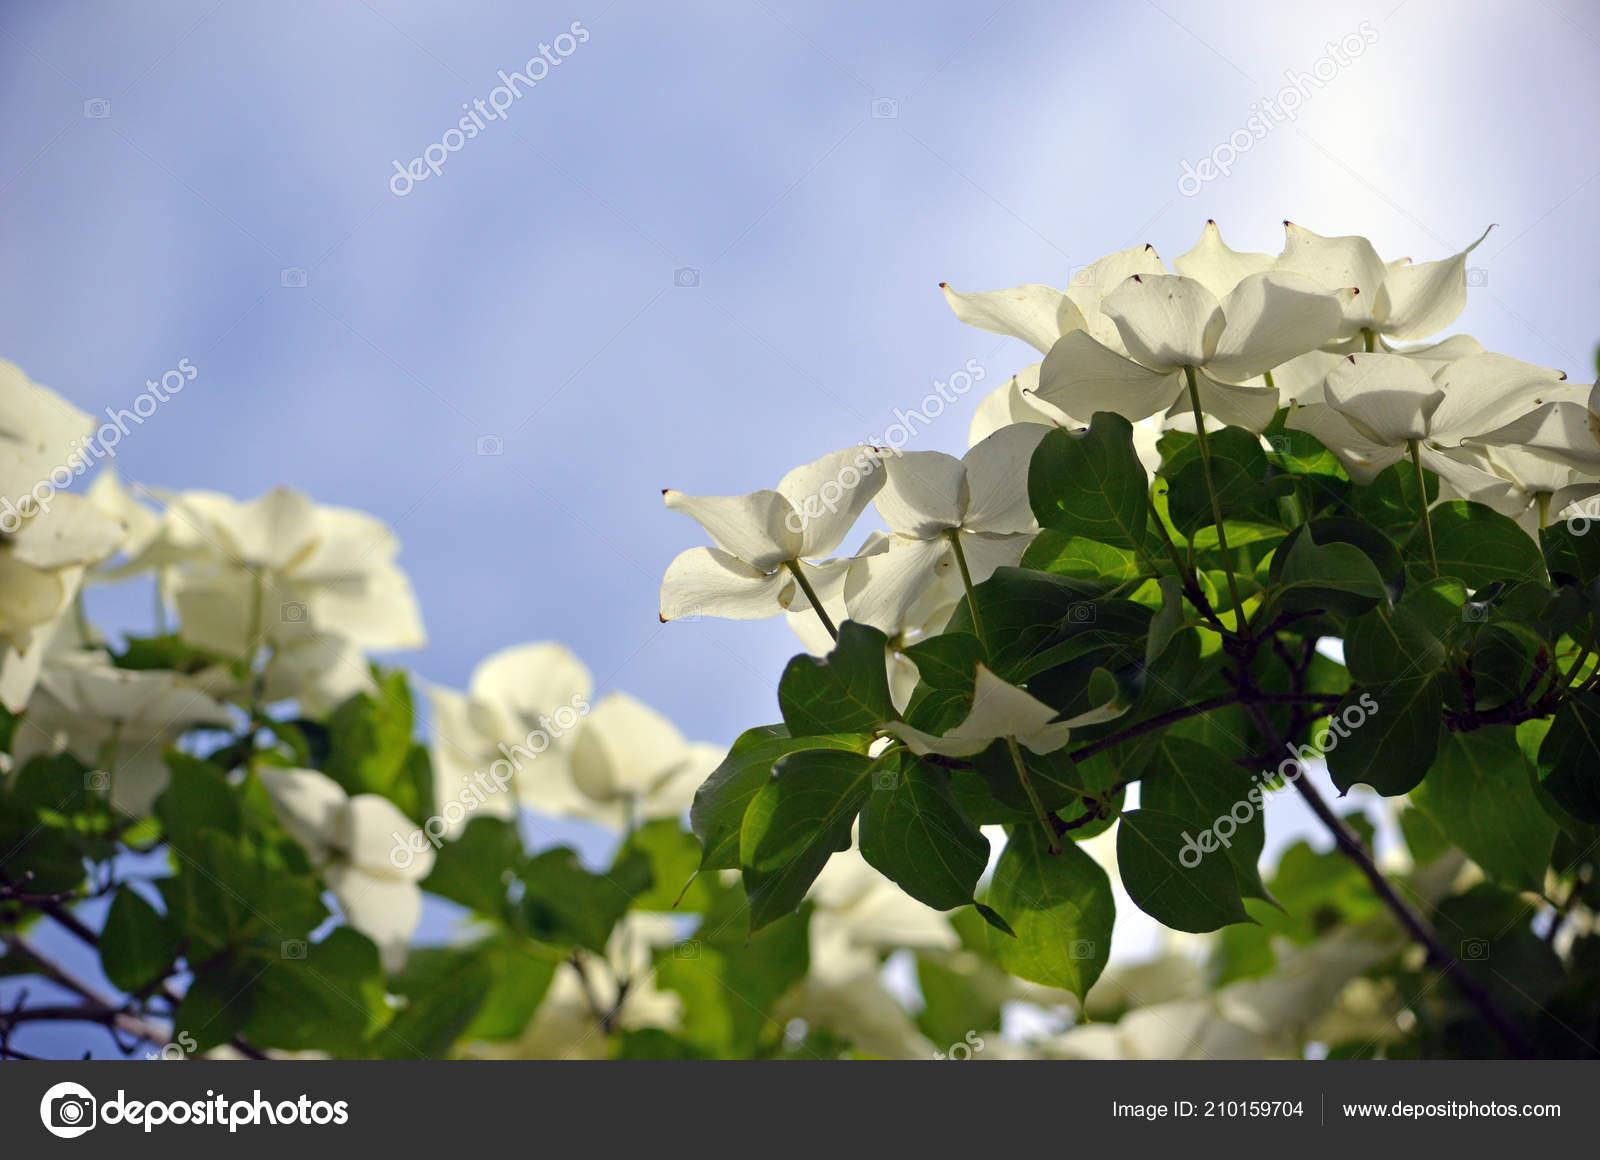 Sunlight Shining White Dogwood Tree Flowers Cornus Florida Fresh